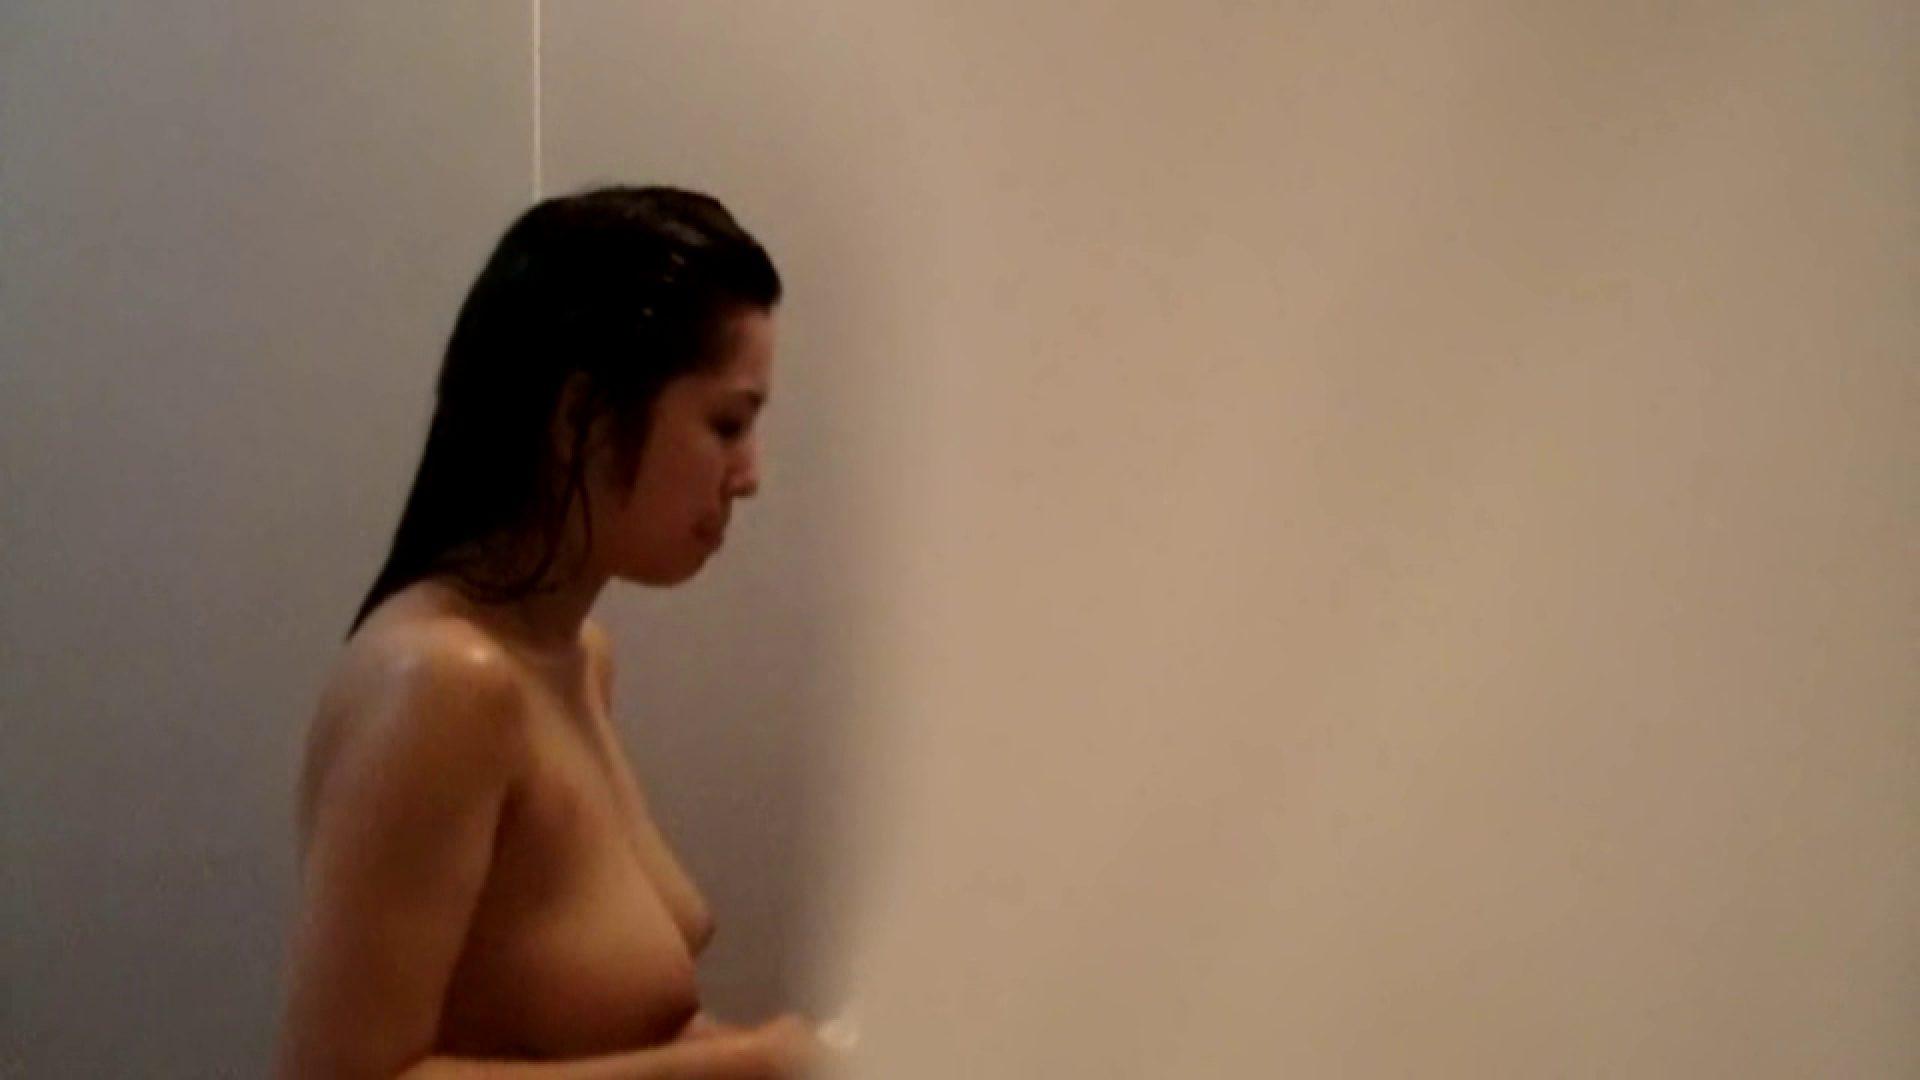 vol.2 葵のグラドル顔負けの爆乳を入浴シーンでどうぞ。 巨乳  64PIX 44